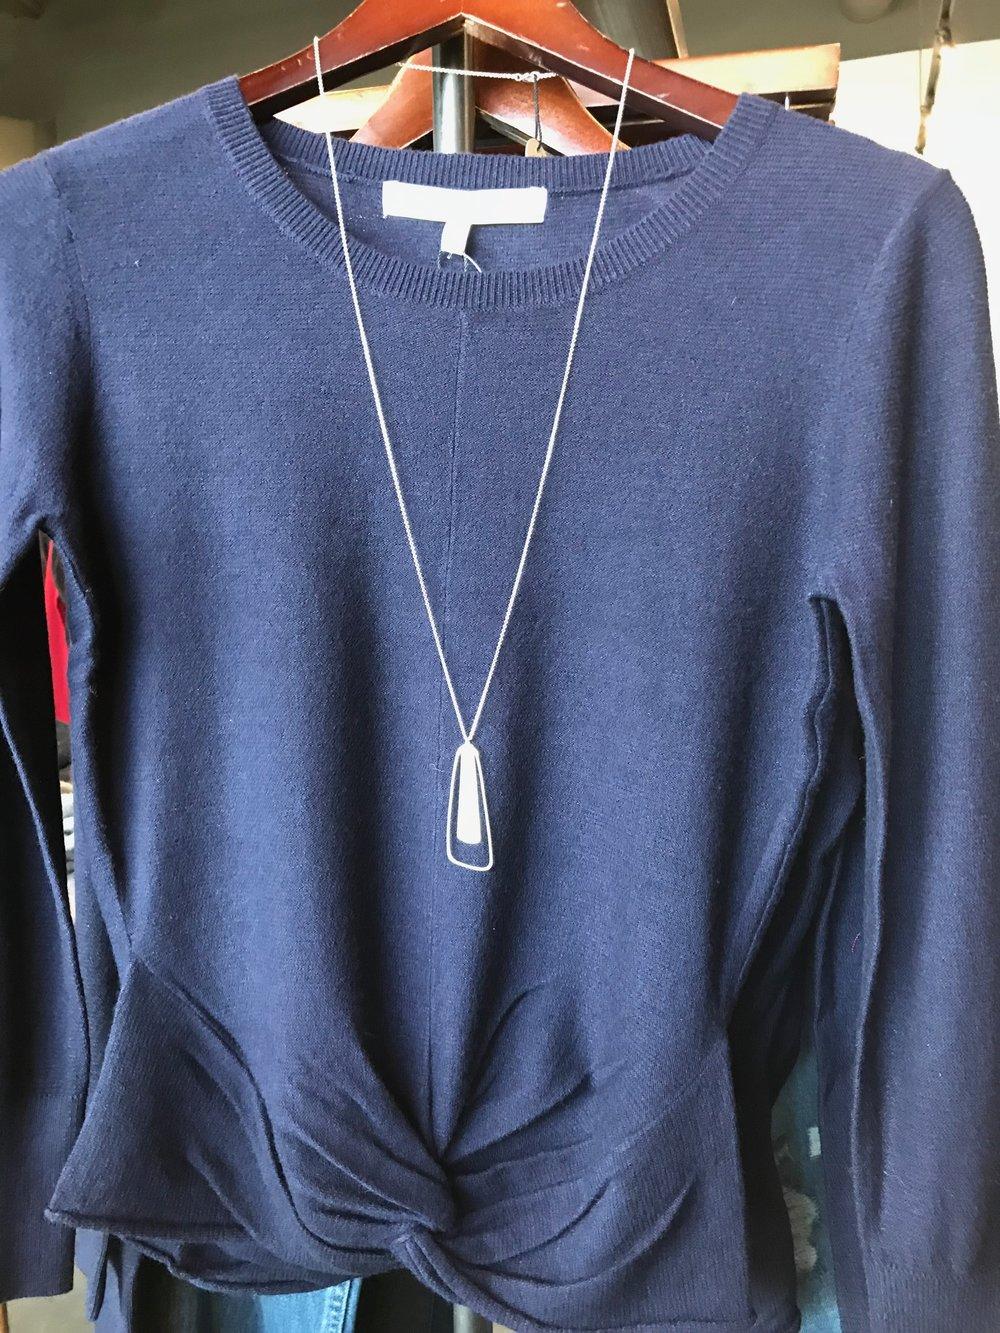 DS sweater.jpg